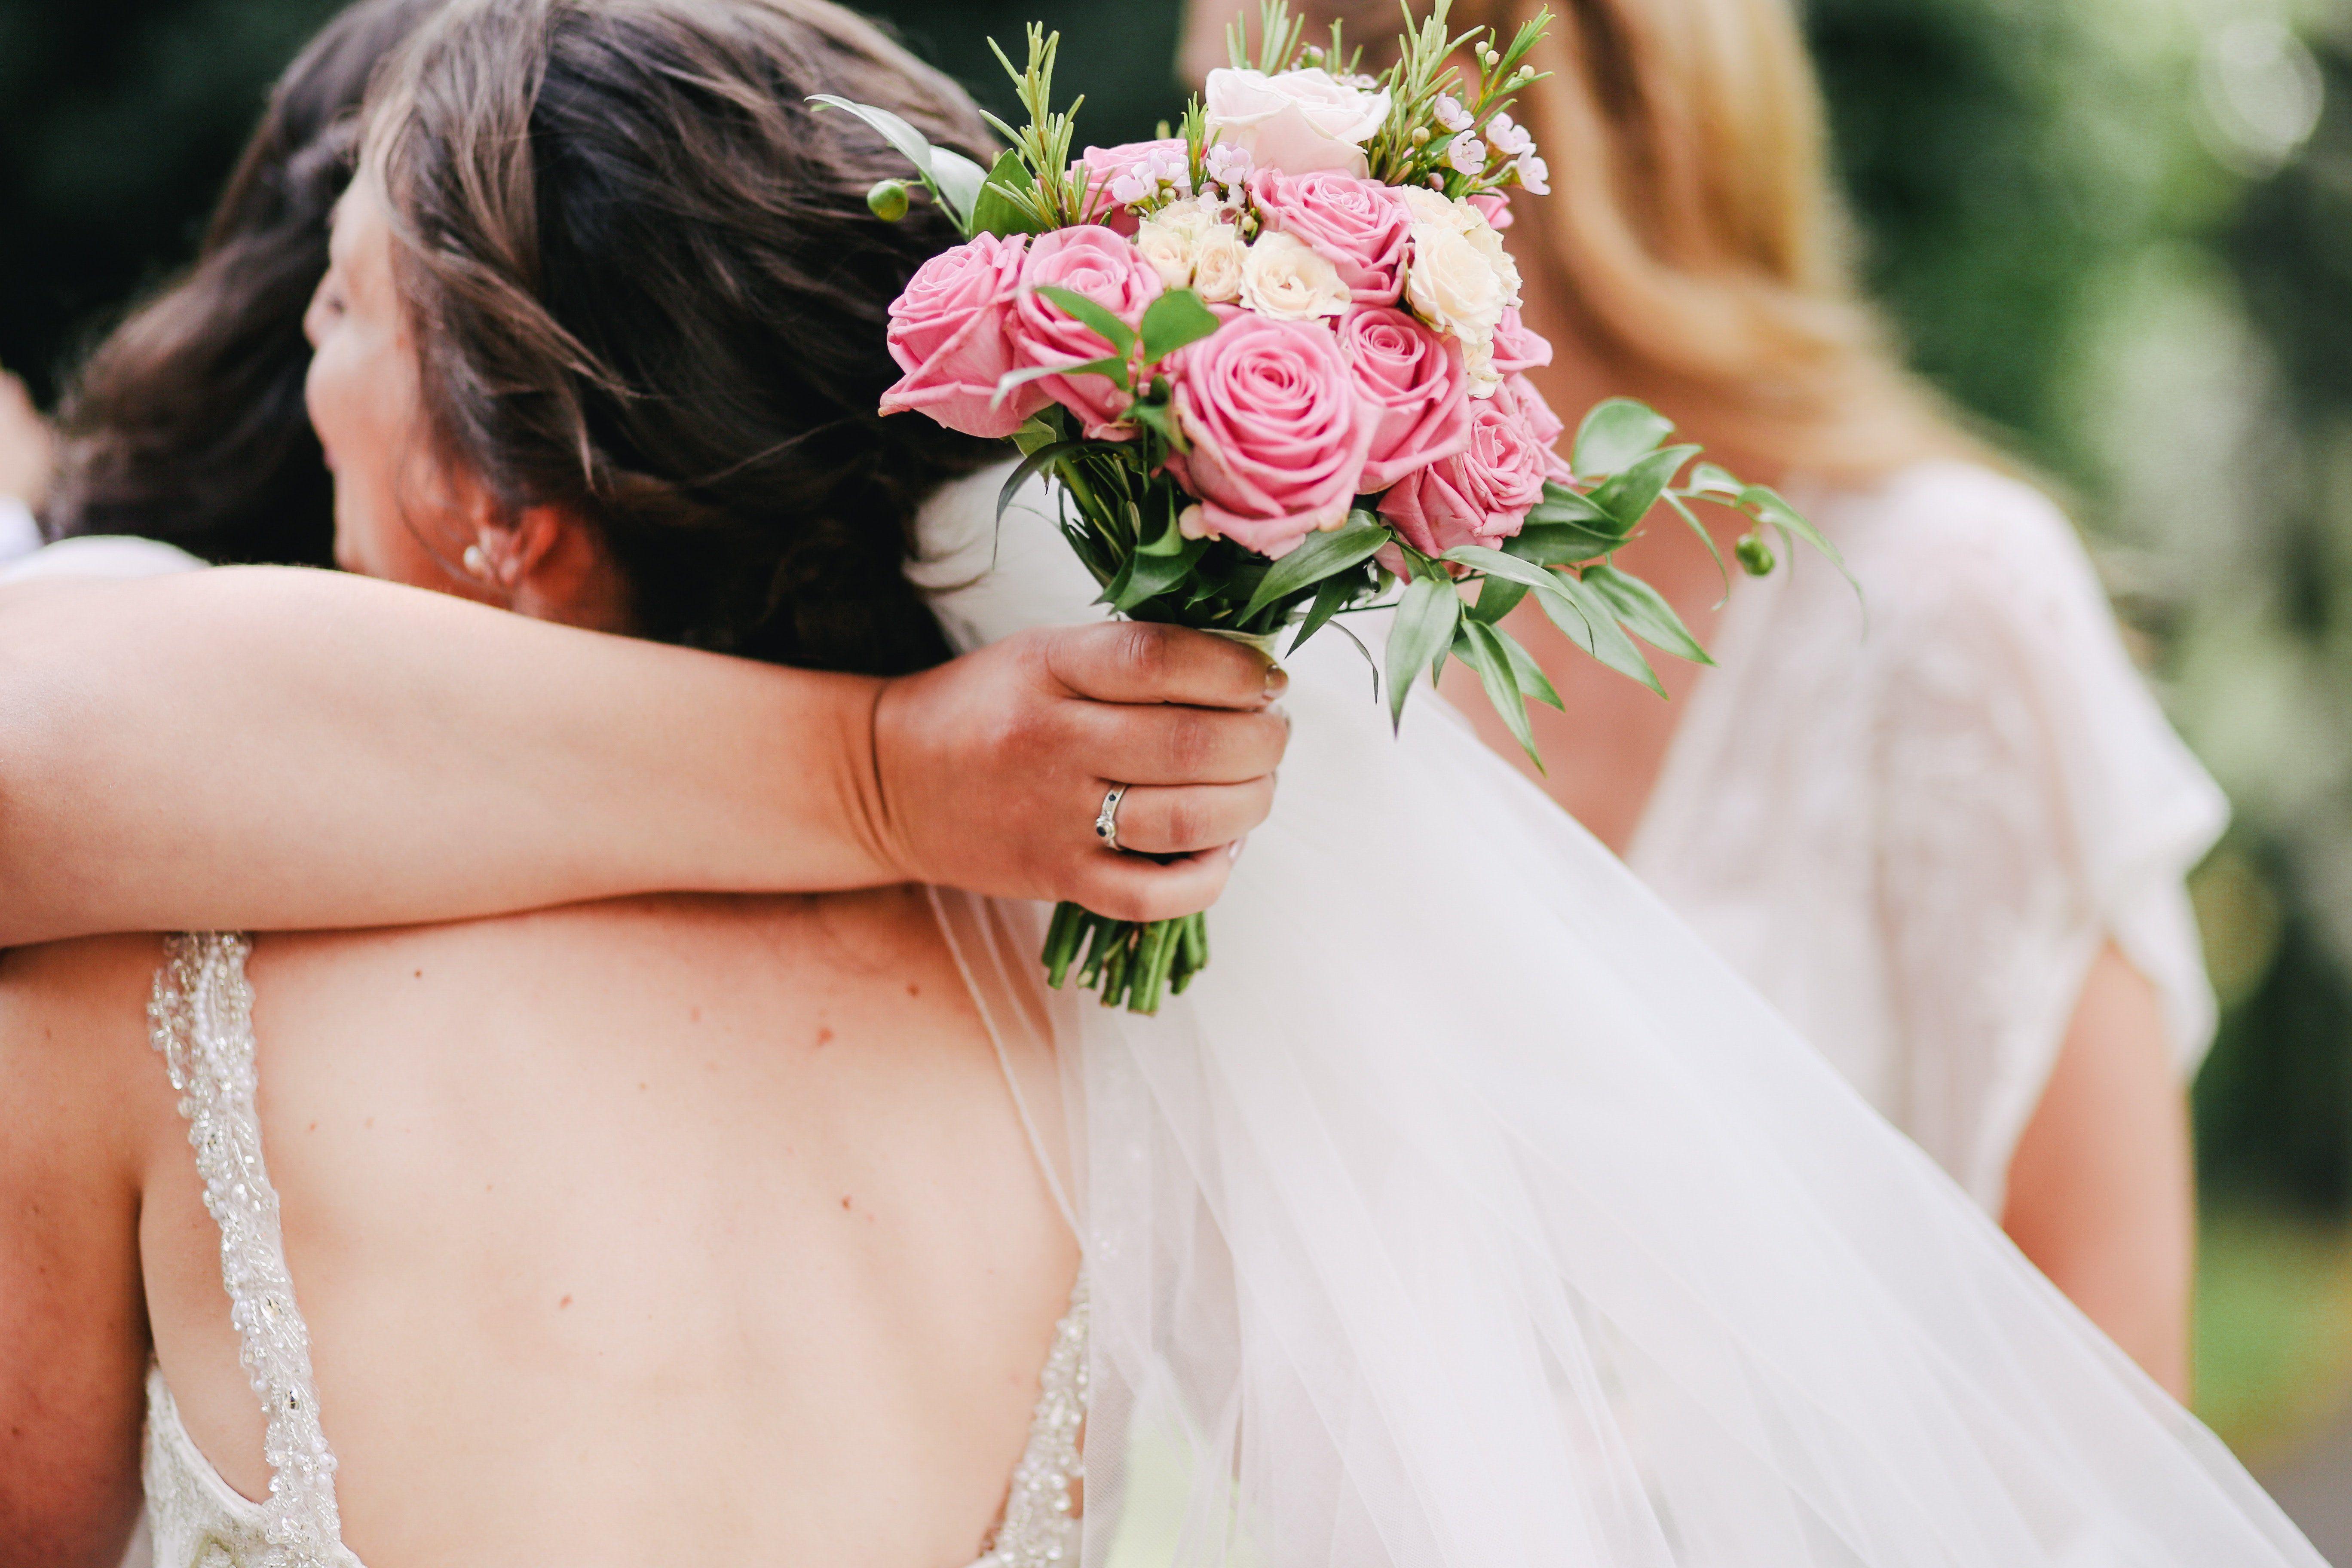 how to sack a bridesmaid